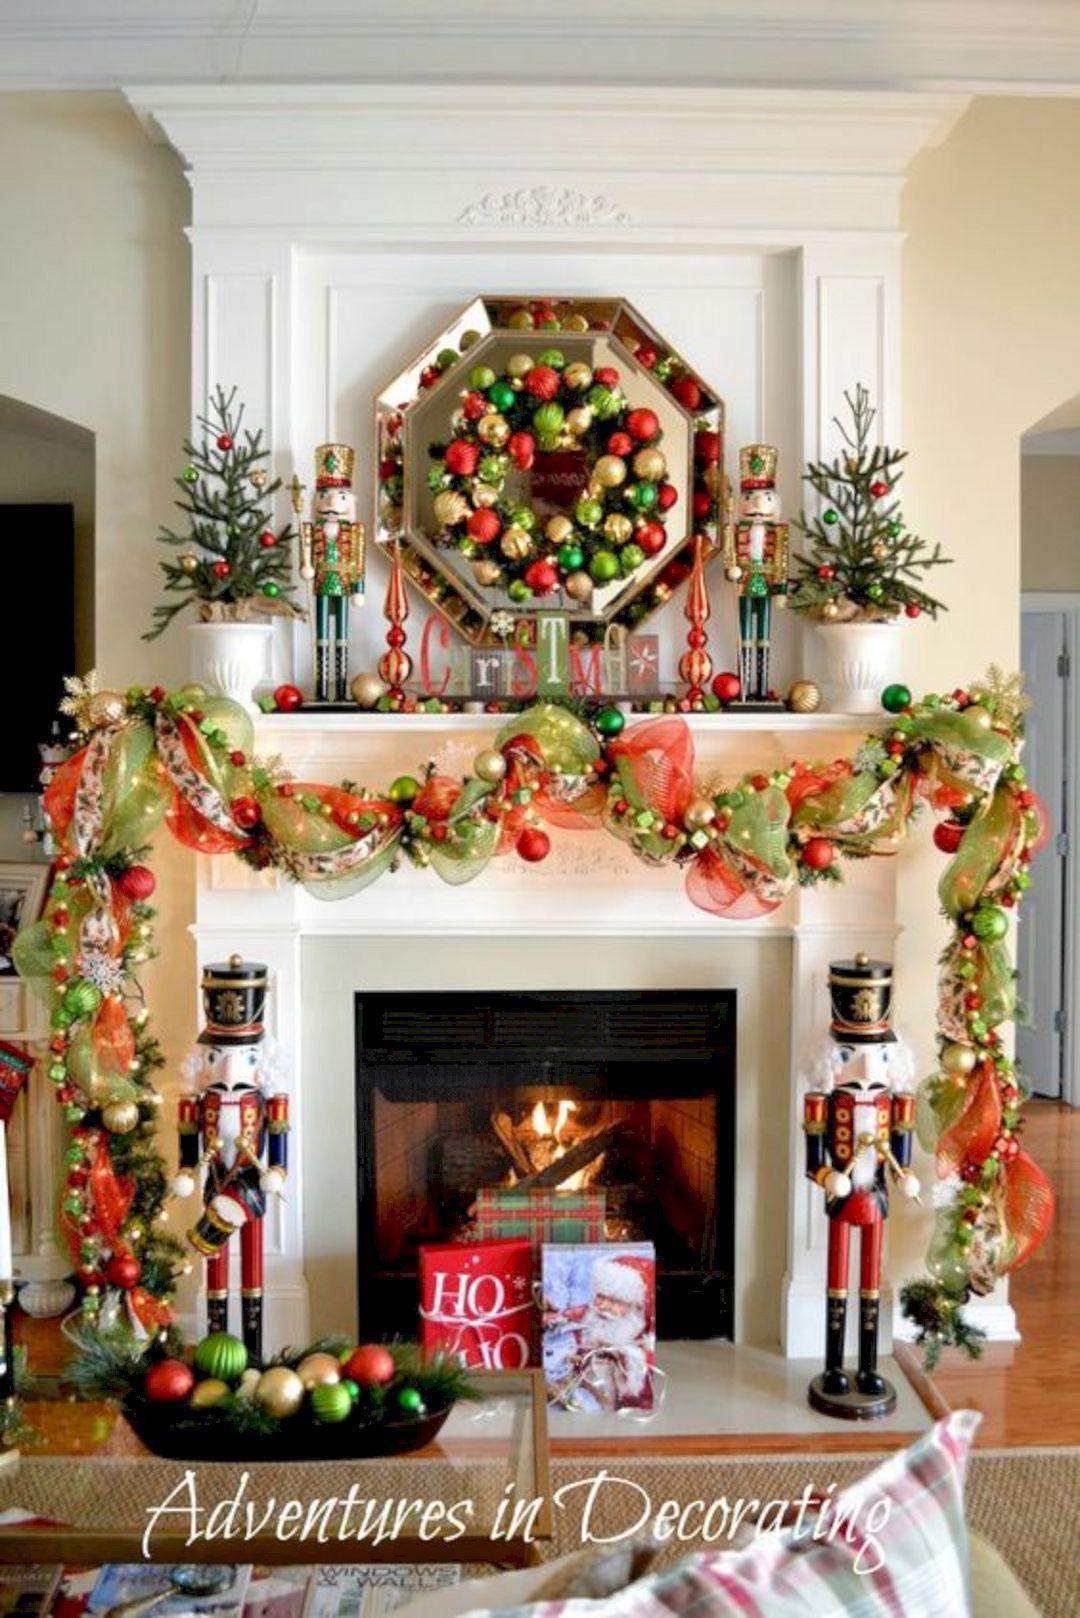 15 Gorgeous Christmas Mantel Decorating Ideas | Diy ...